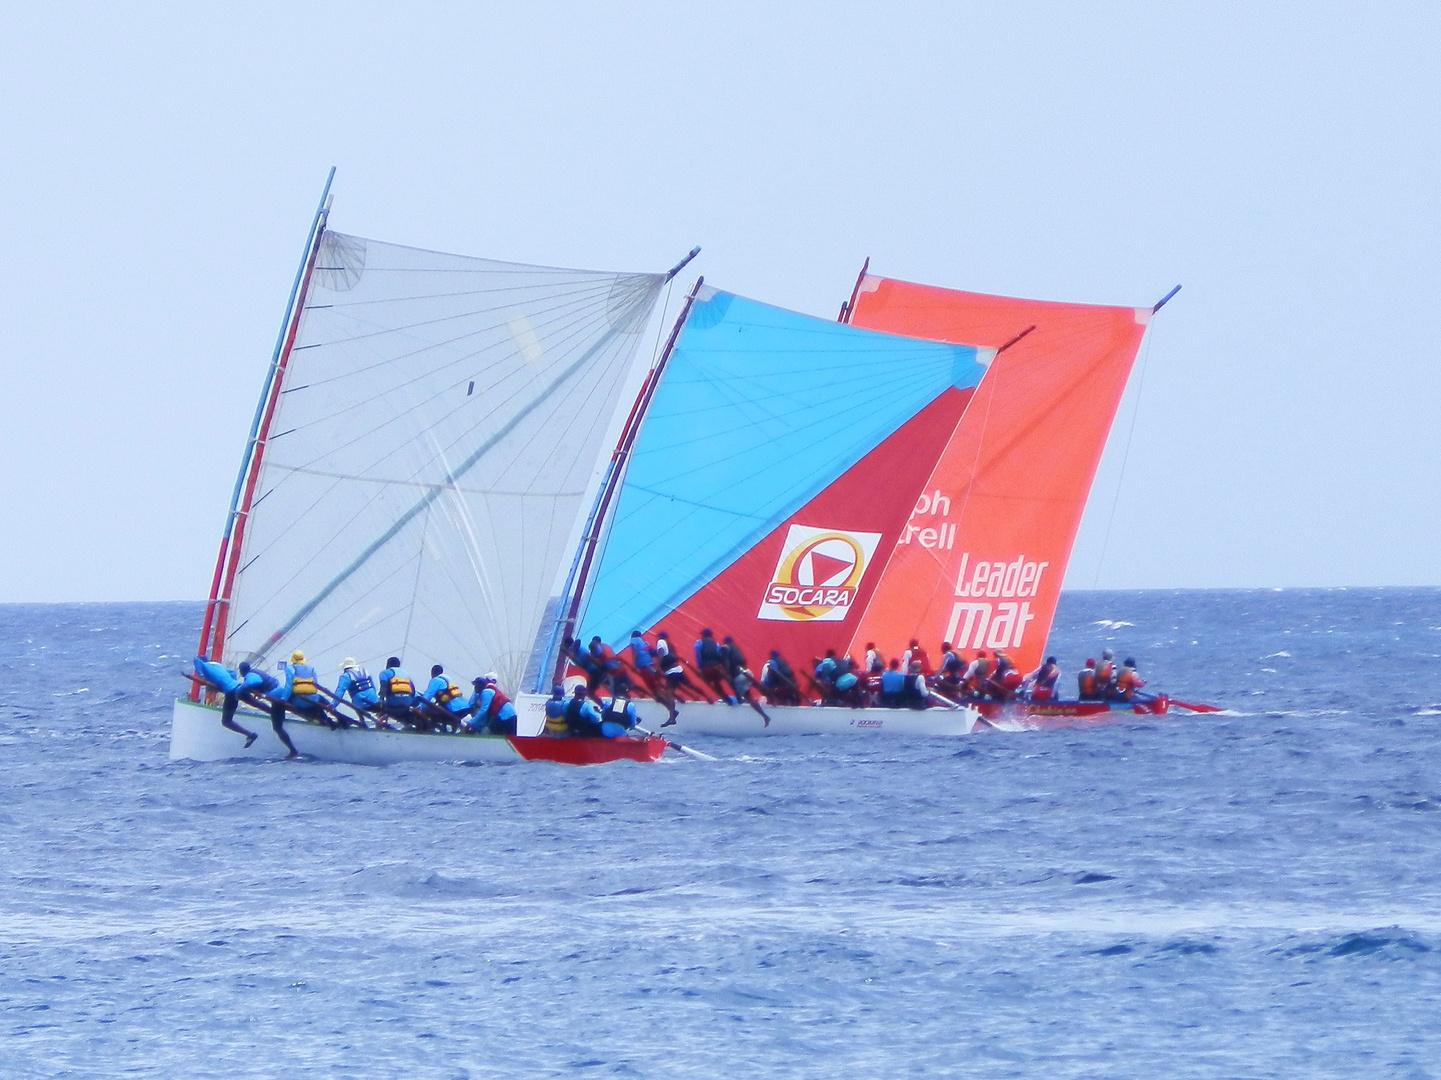 Yole-Regatten - Martinique